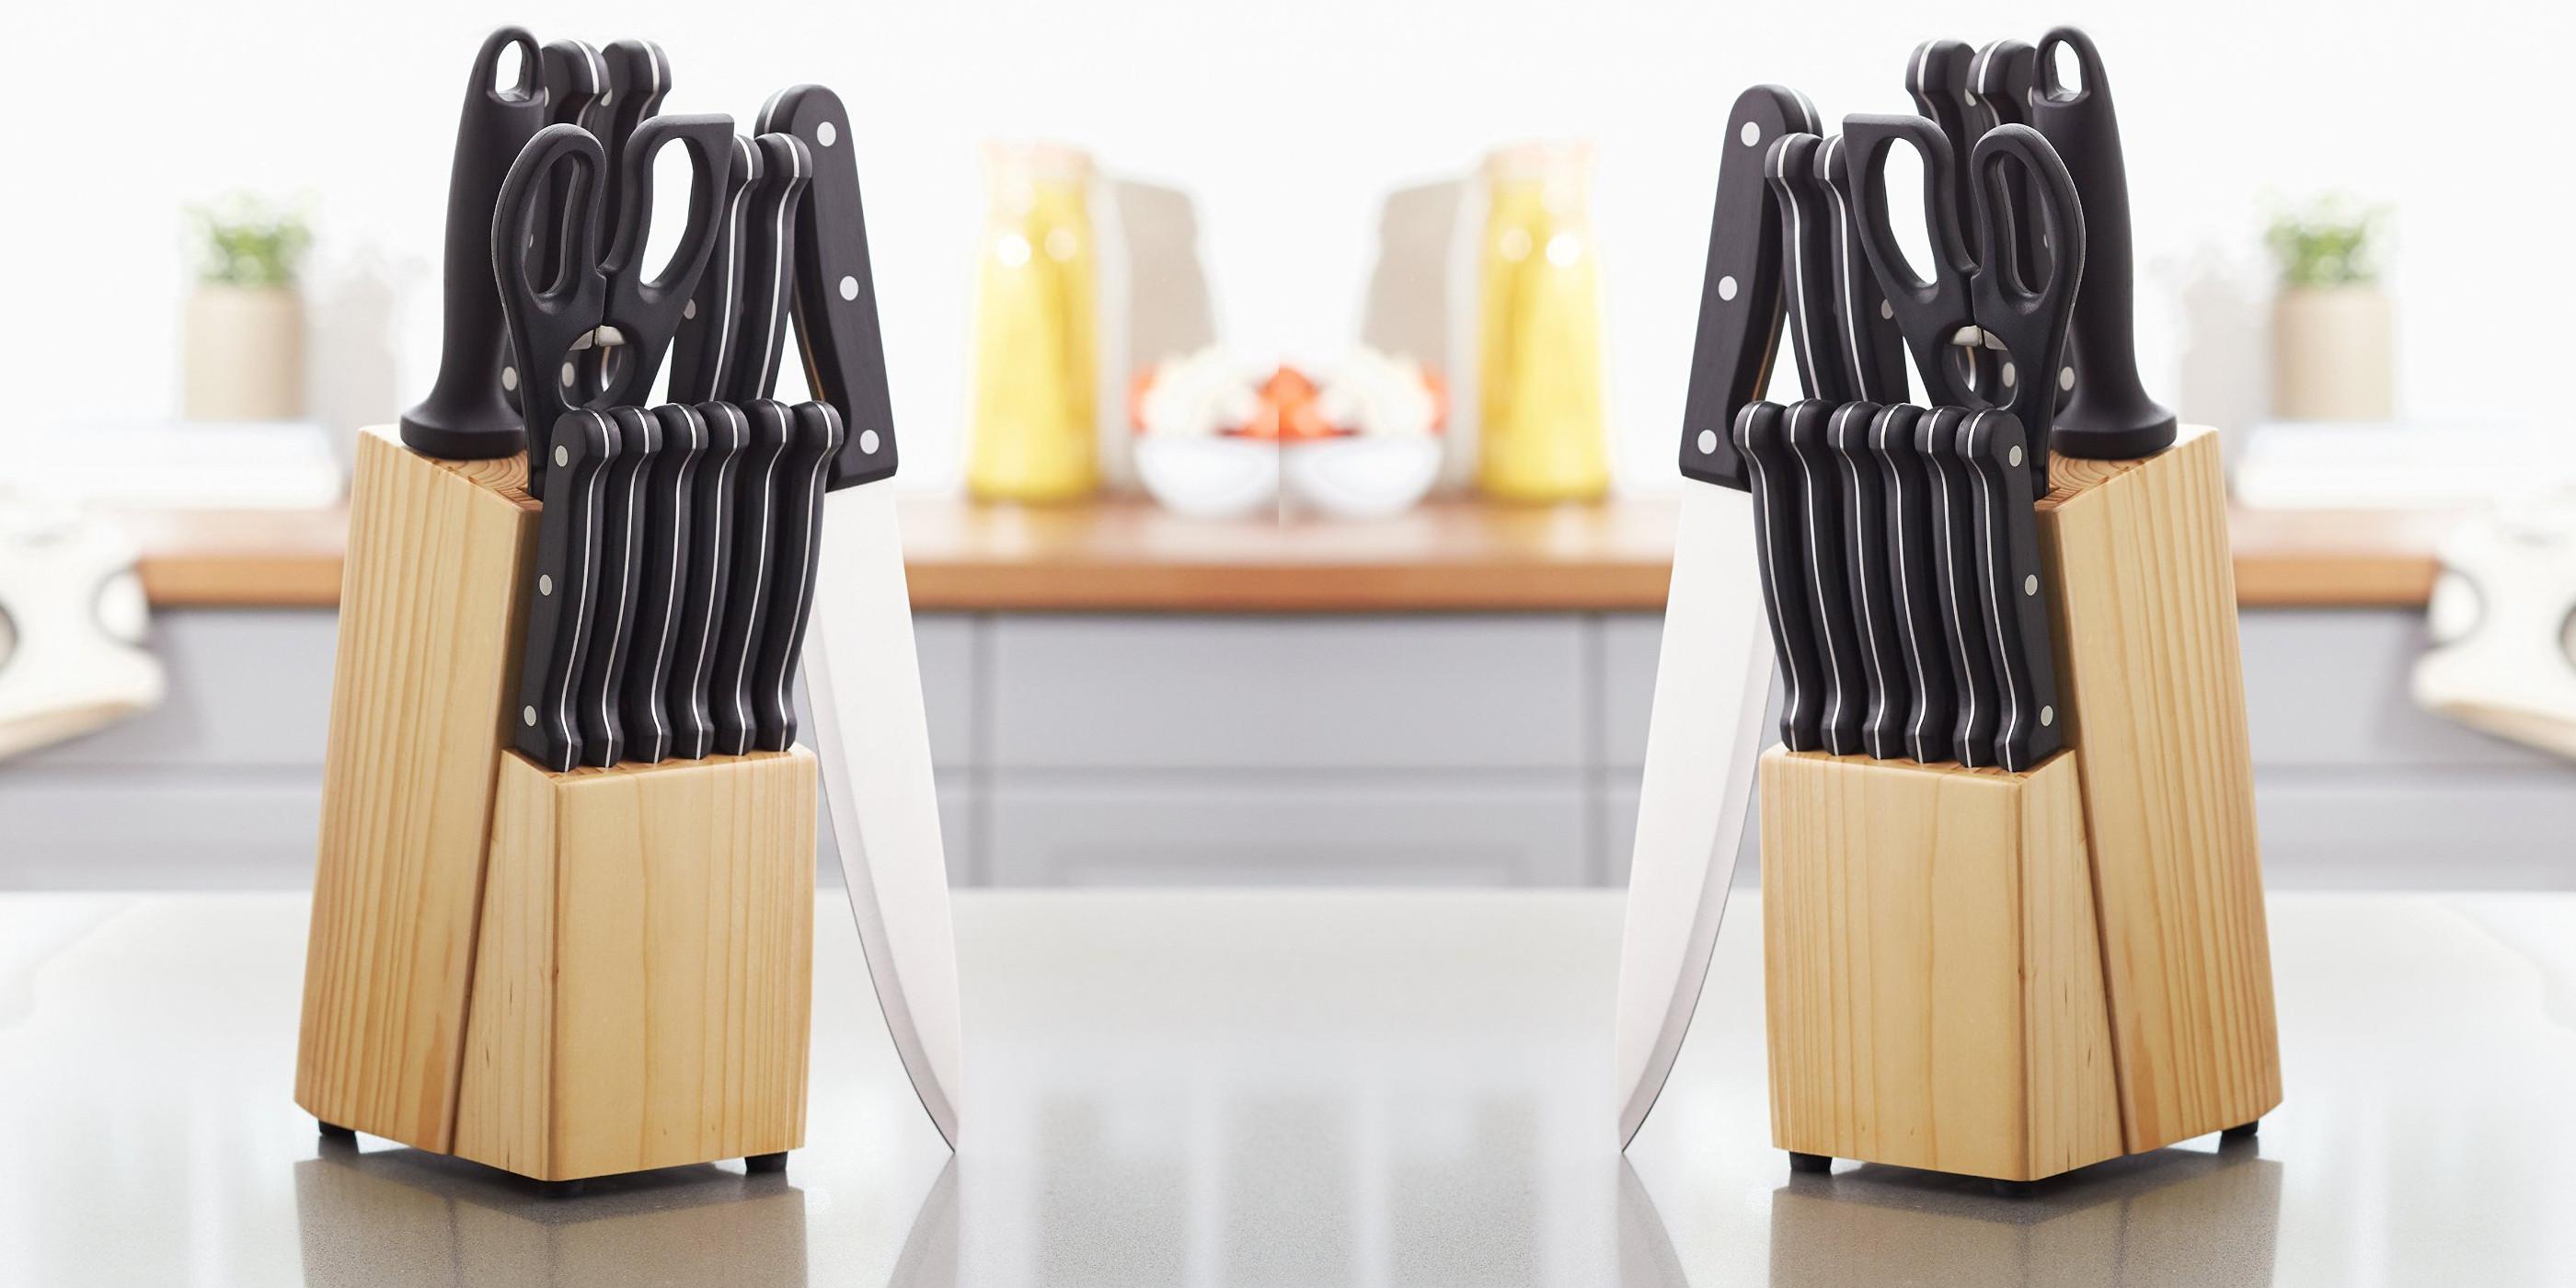 amazonbasics-14-piece-knife-set-with-block-5